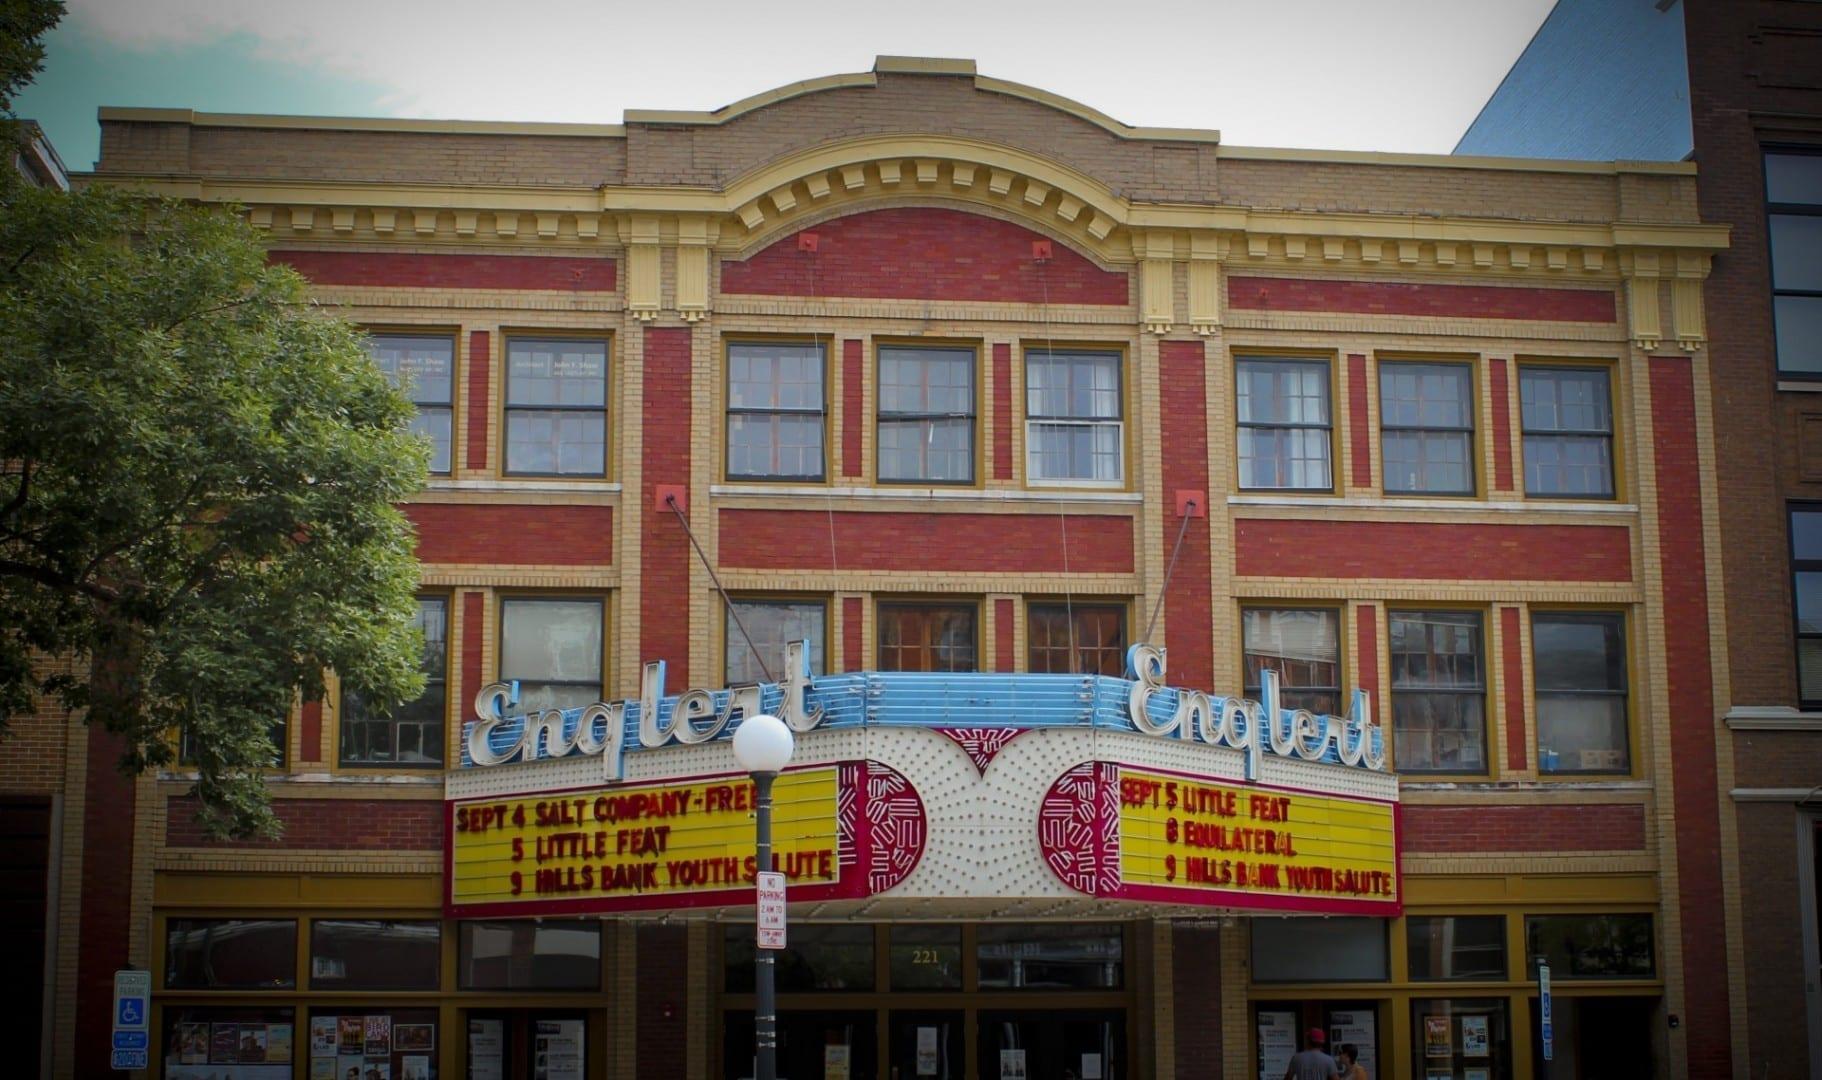 Teatro Englert Iowa City IA Estados Unidos